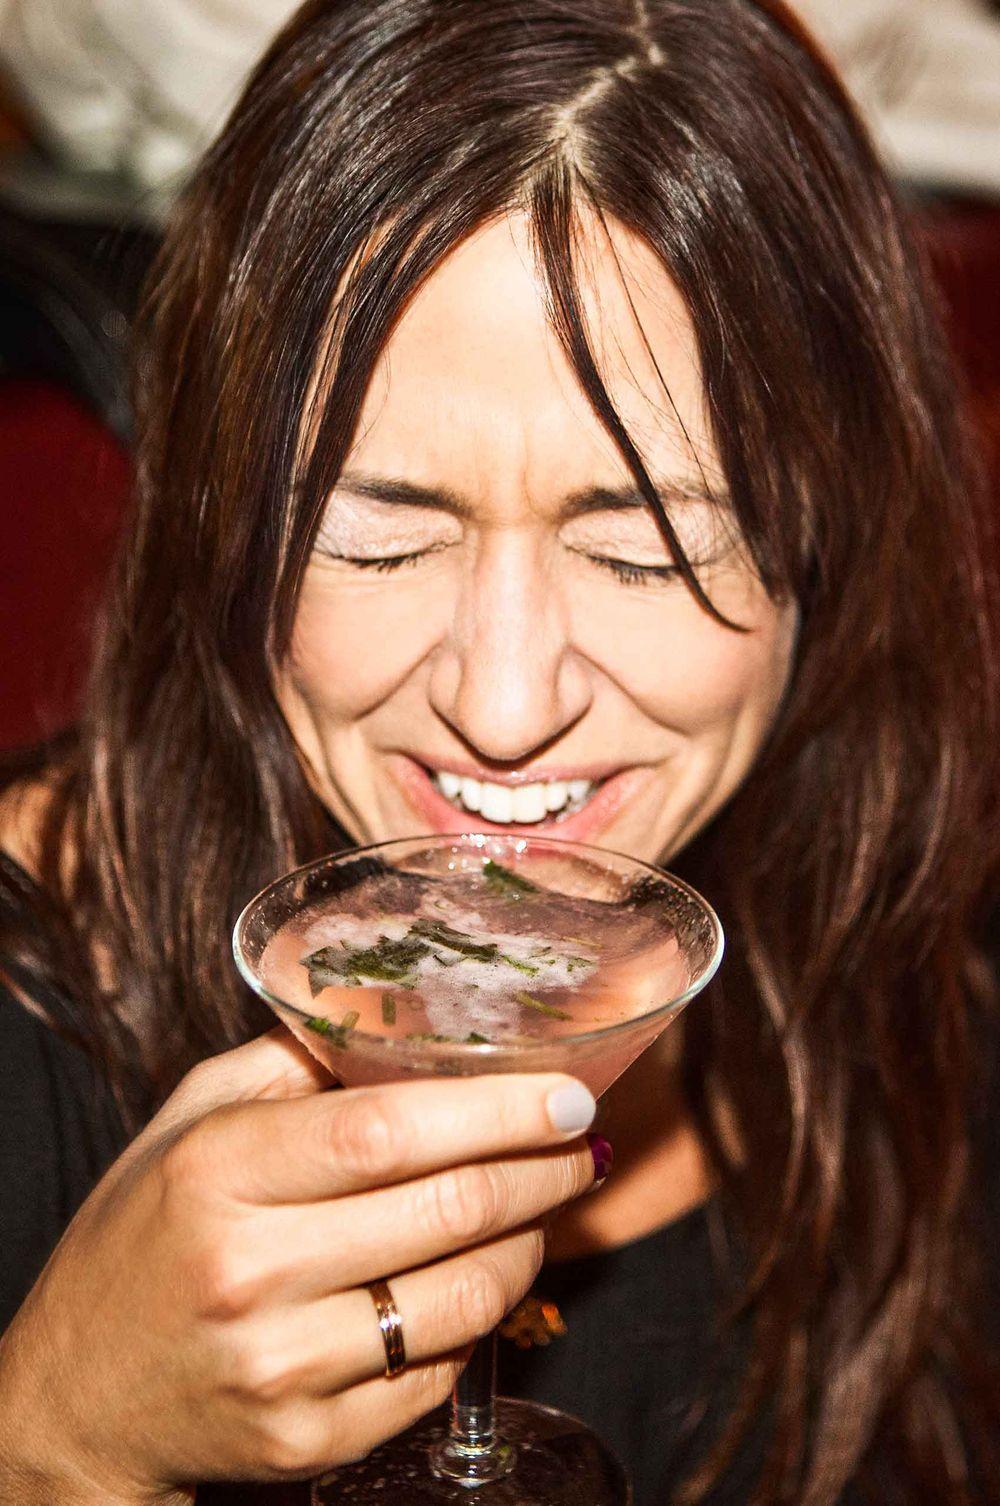 Laughing-Woman-drinking-martini-by-HenrikOlundPhotography..jpg